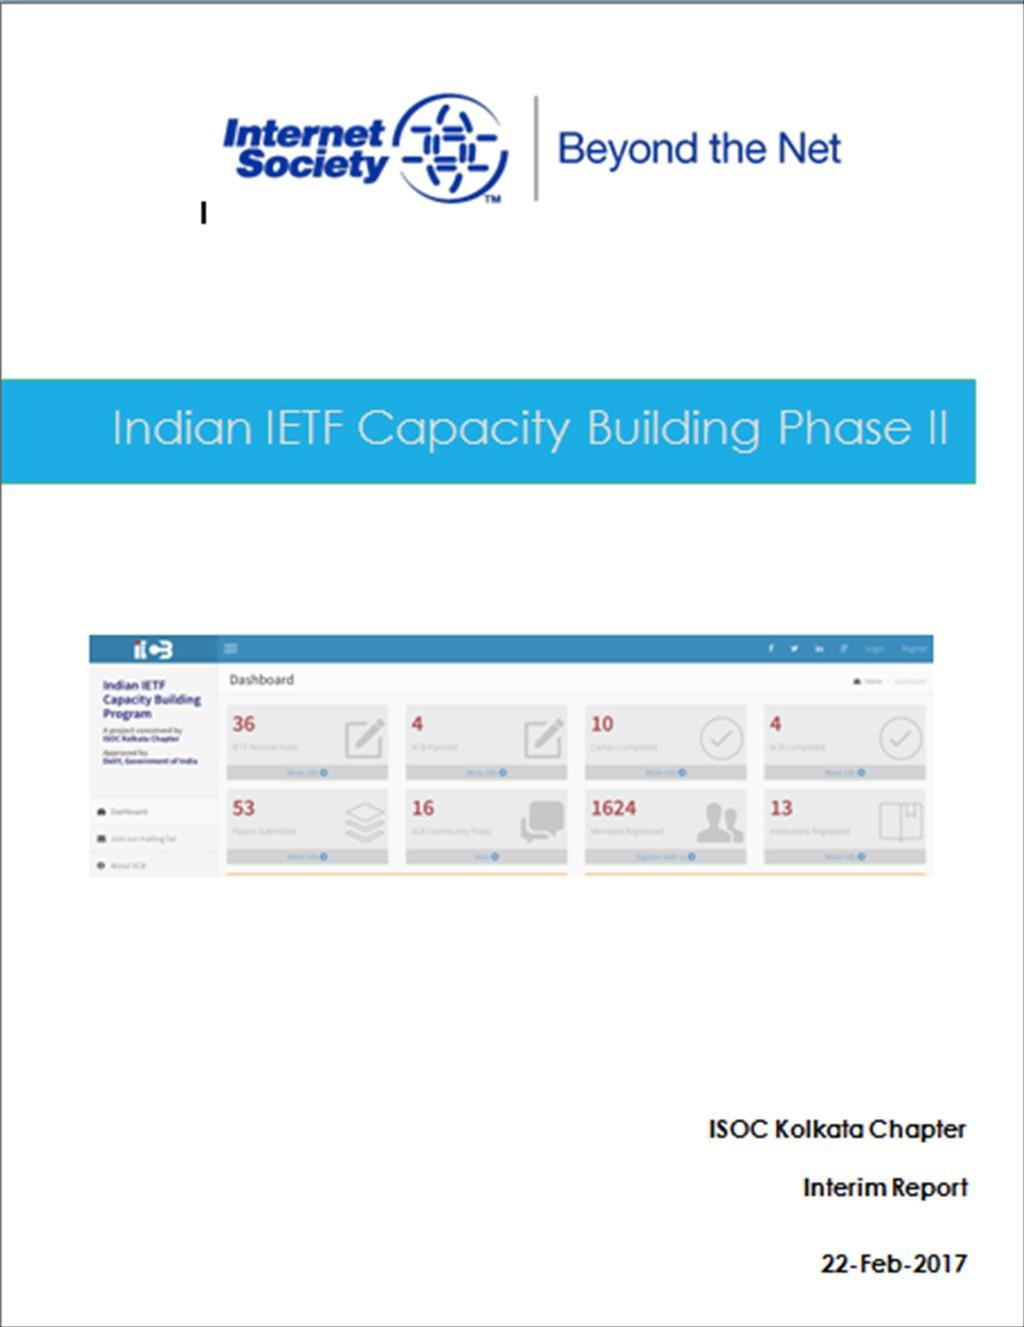 Indian IETF Capacity Building Phase II - Interim Report